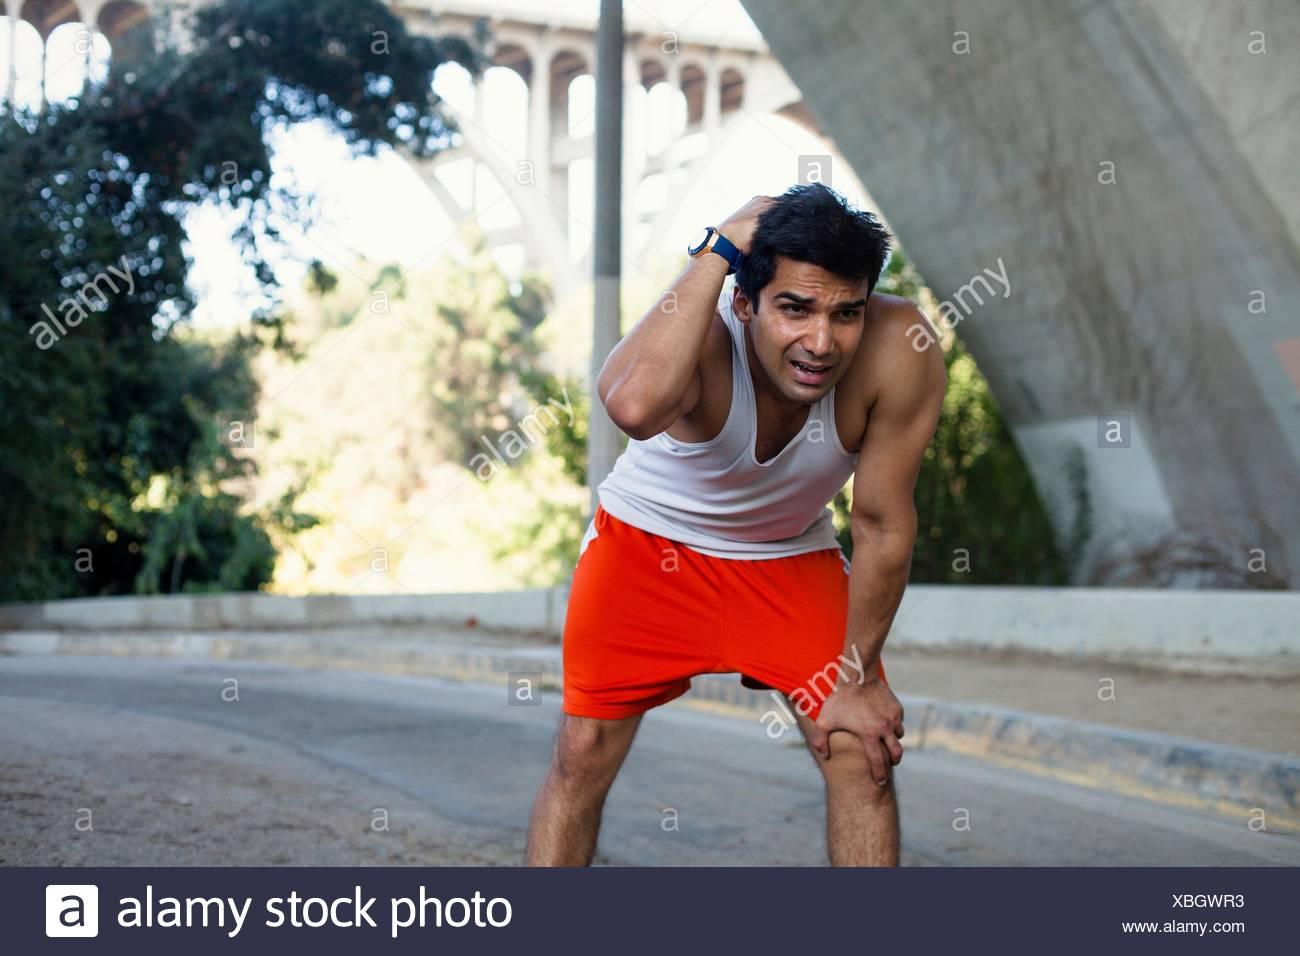 Jogger exhausted, taking break, Arroyo Seco Park, Pasadena, California, USA - Stock Image